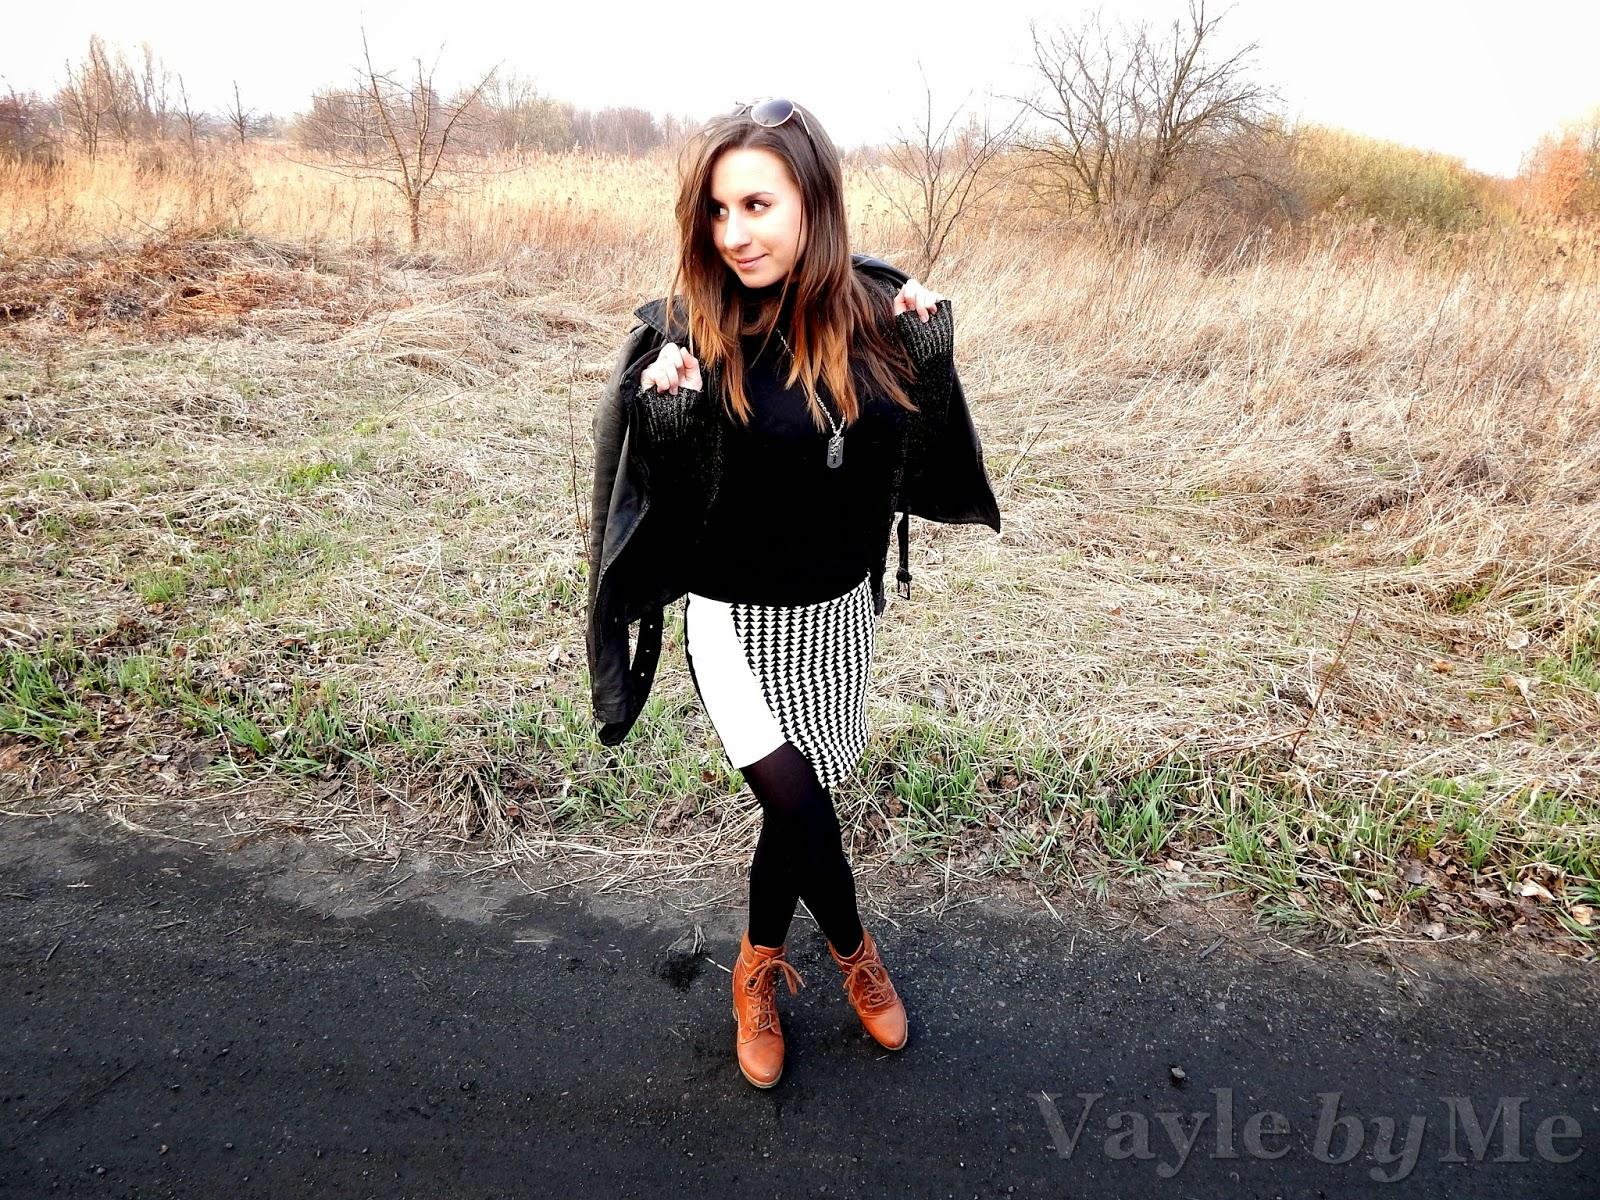 http://vaylebyme.blogspot.com/2014/03/wymodelowane-asymetrycznie.html